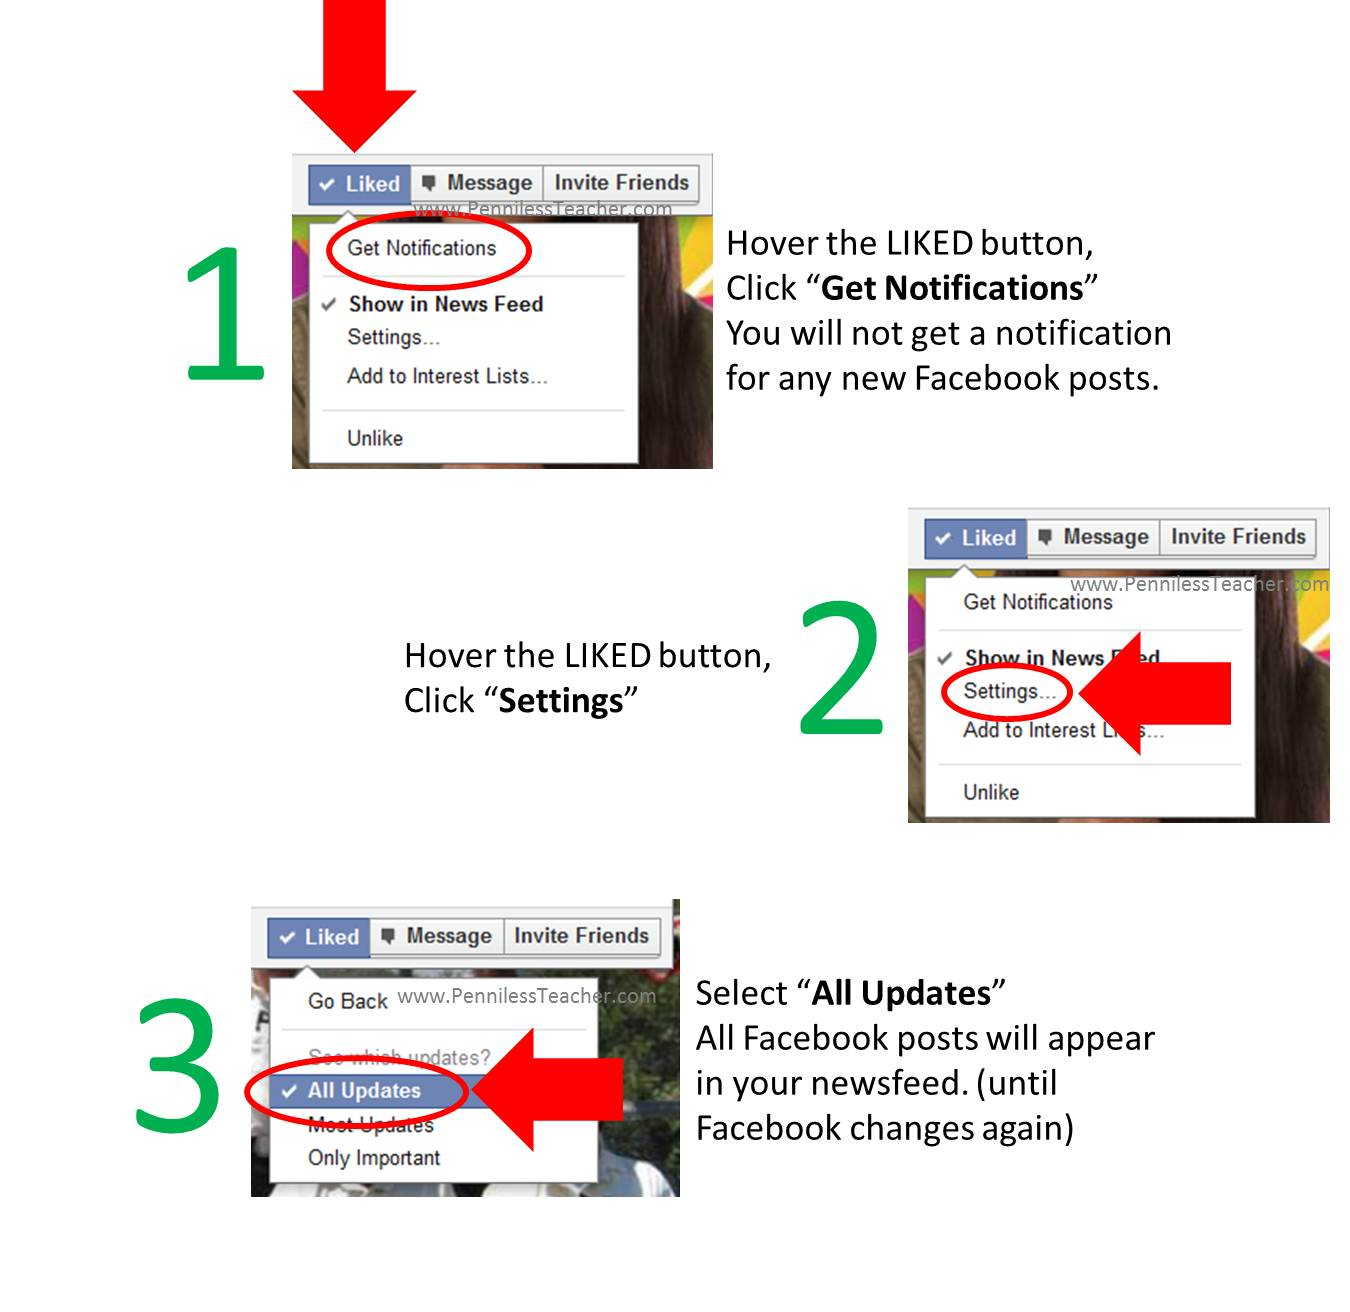 FacebookGetNotifications7.13.13